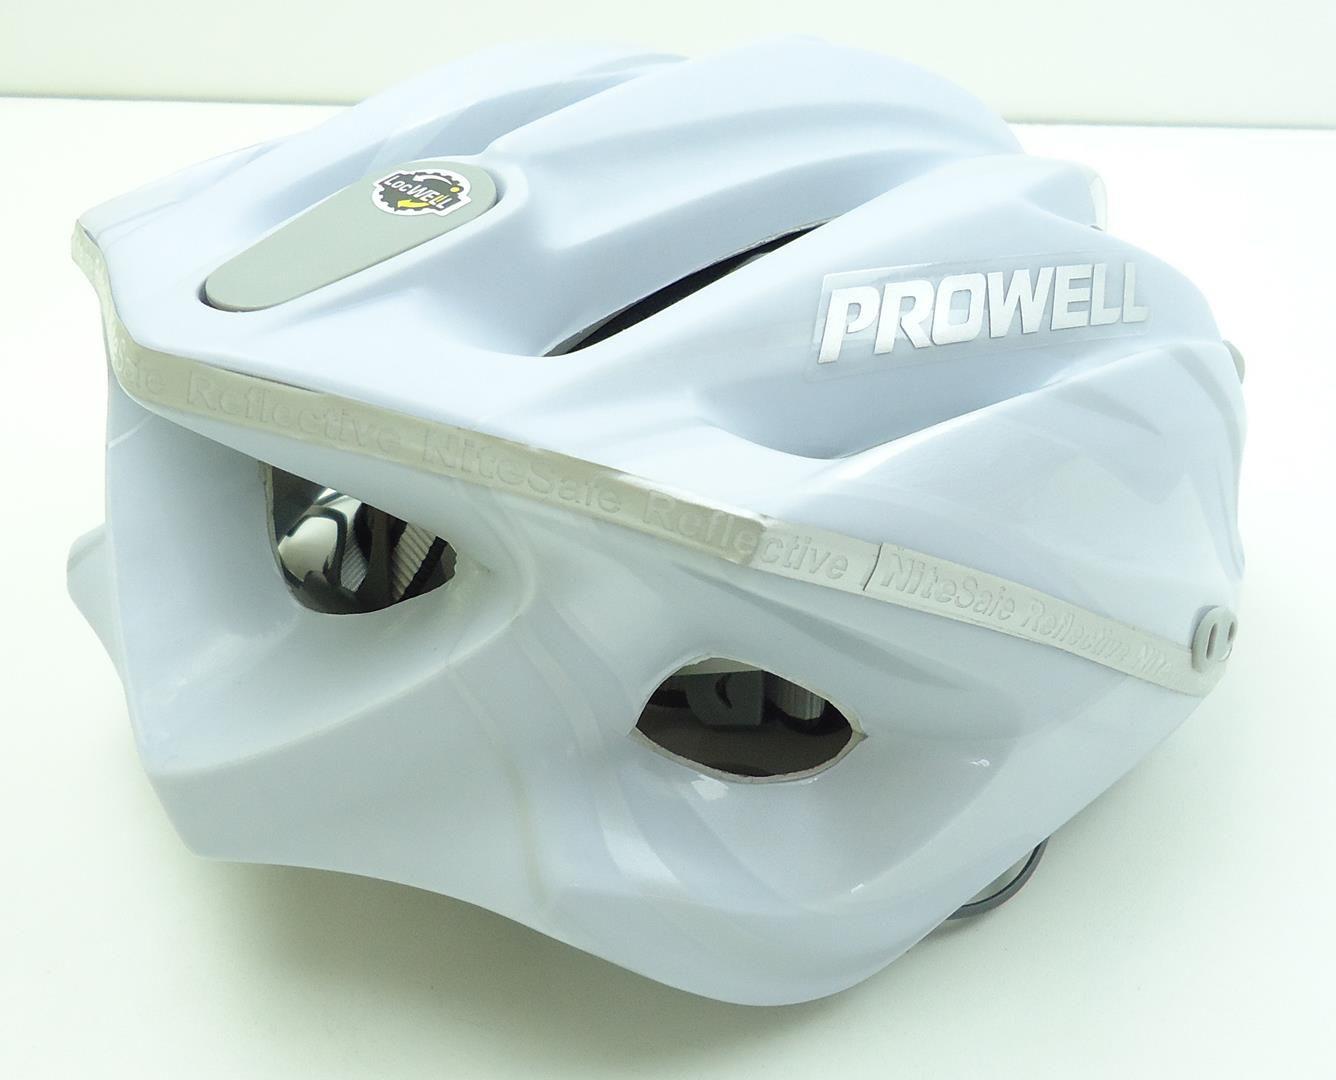 Capacete Bicicleta Prowell F4000 Hurricane Cor Branco Tamanho P Com Viseira